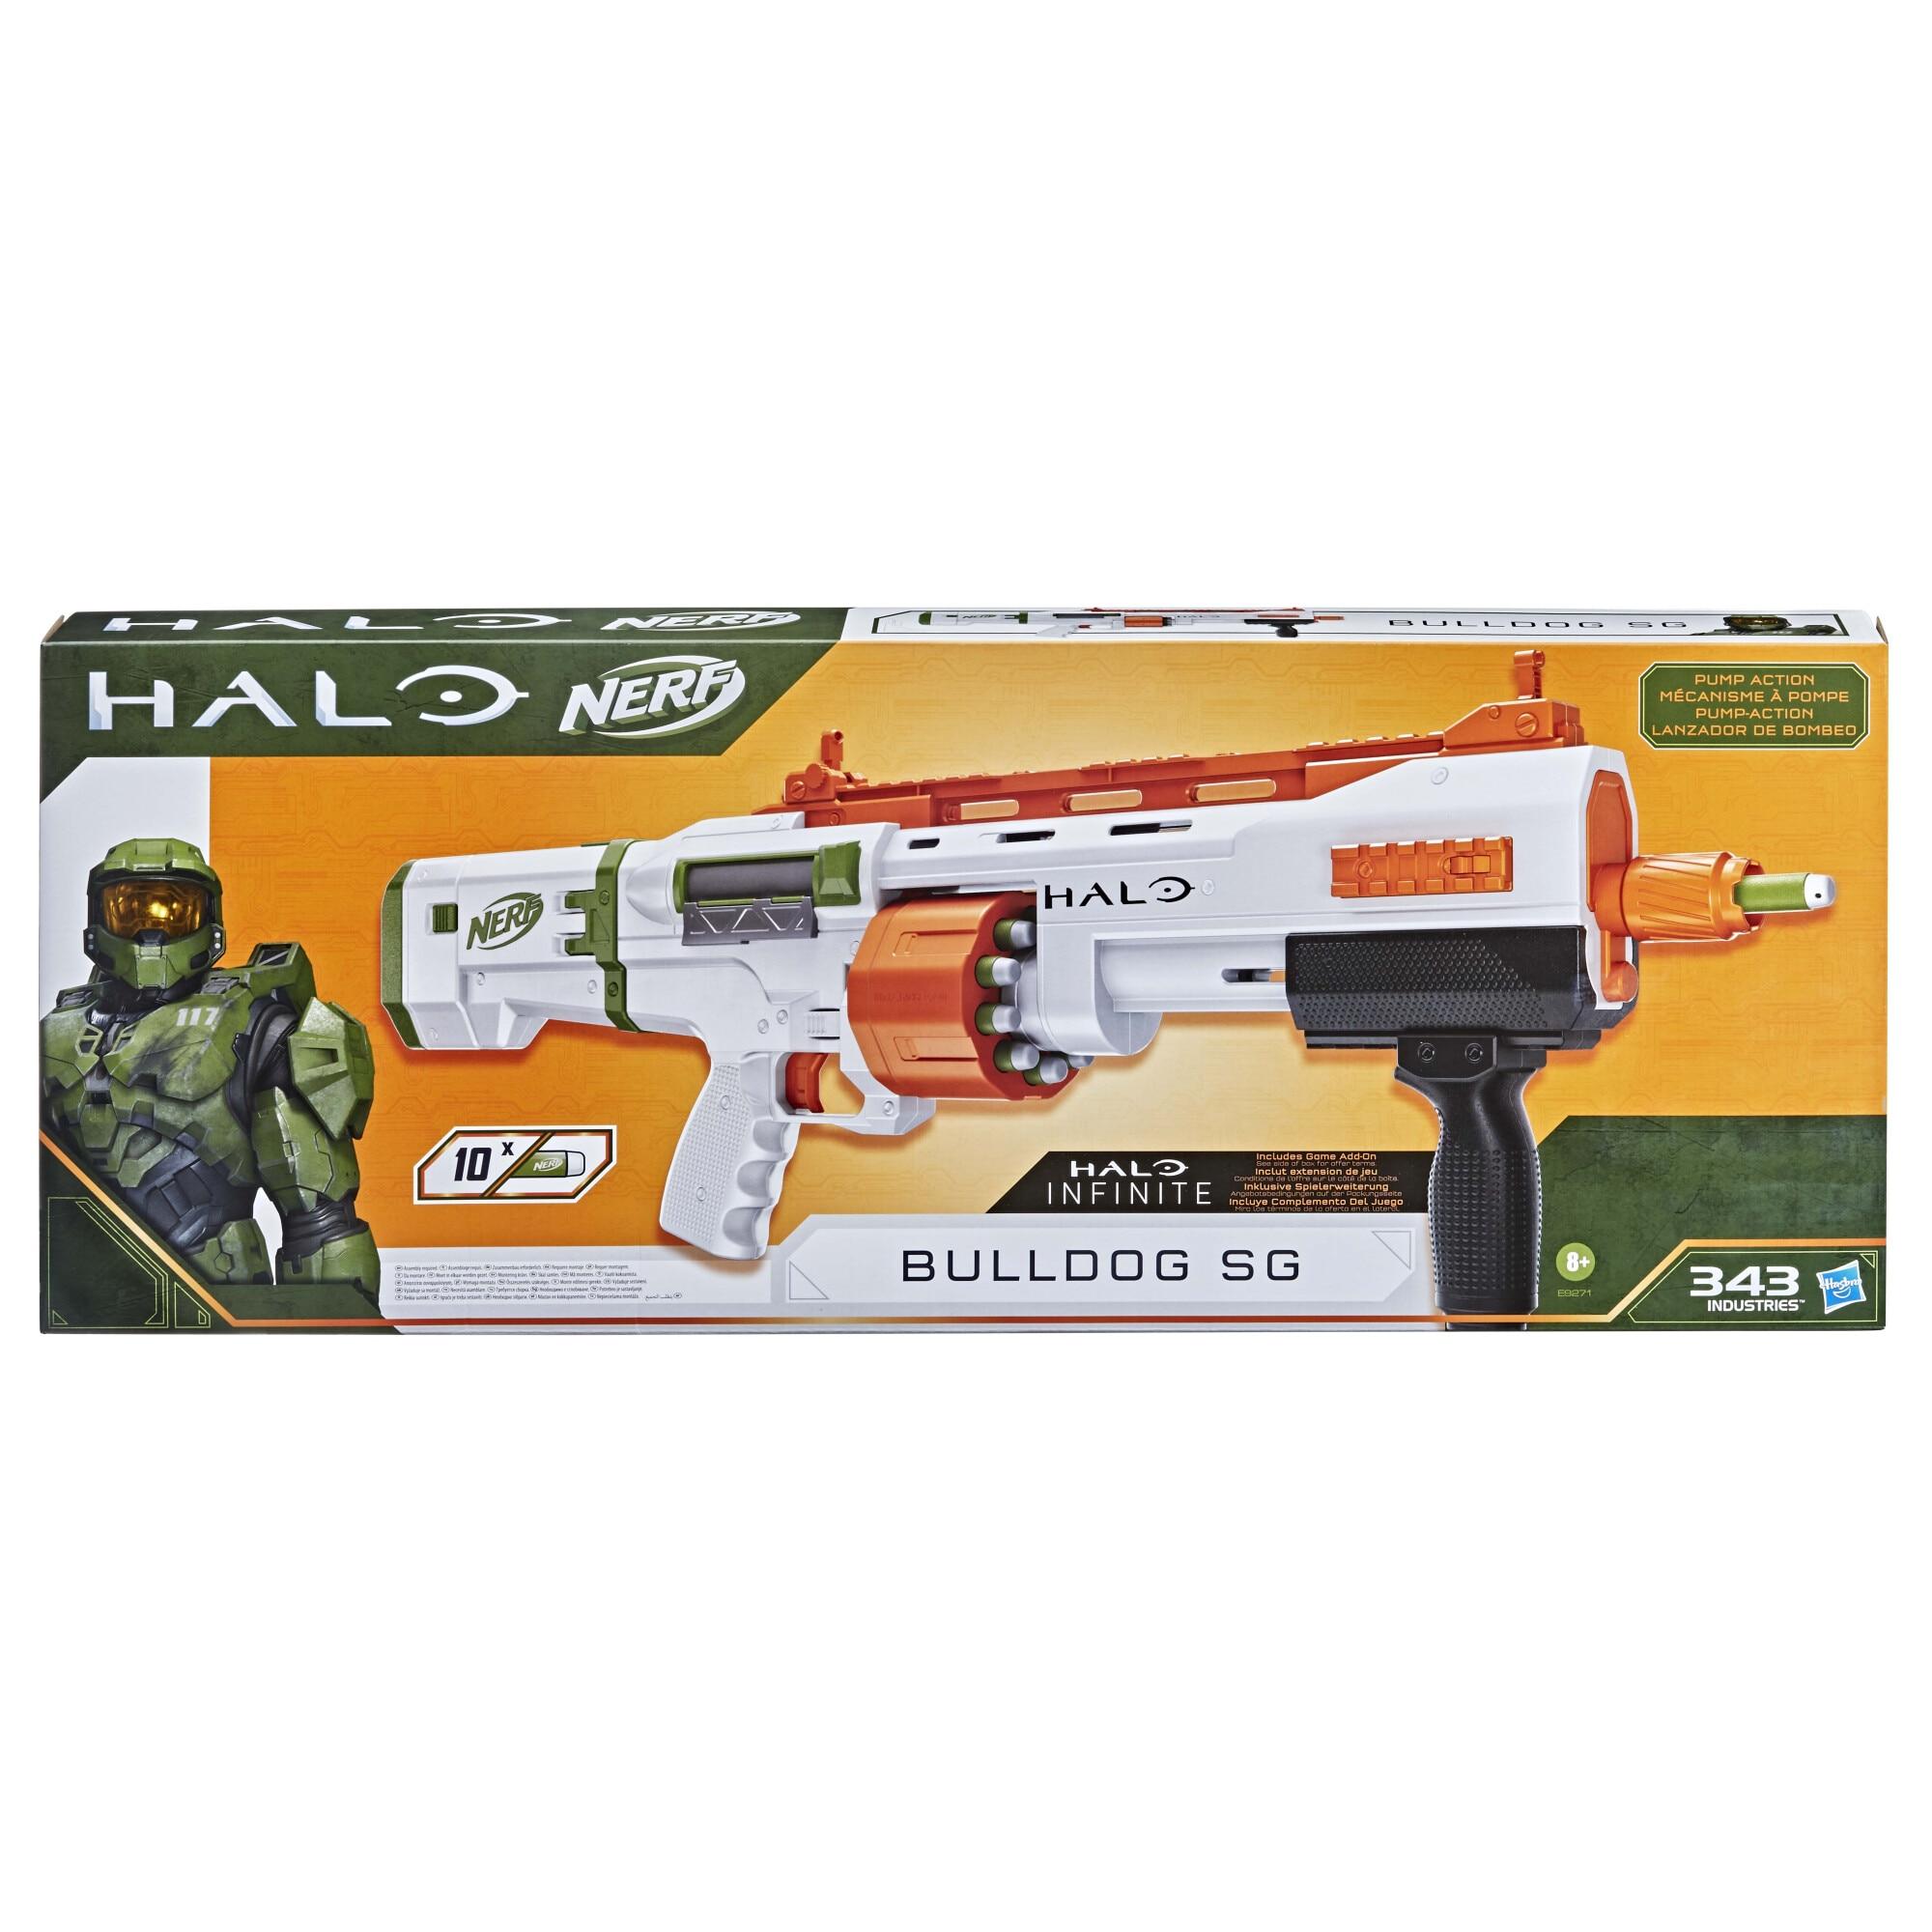 Fotografie Blaster Nerf - Halo Bulldog SG, 10 proiectile